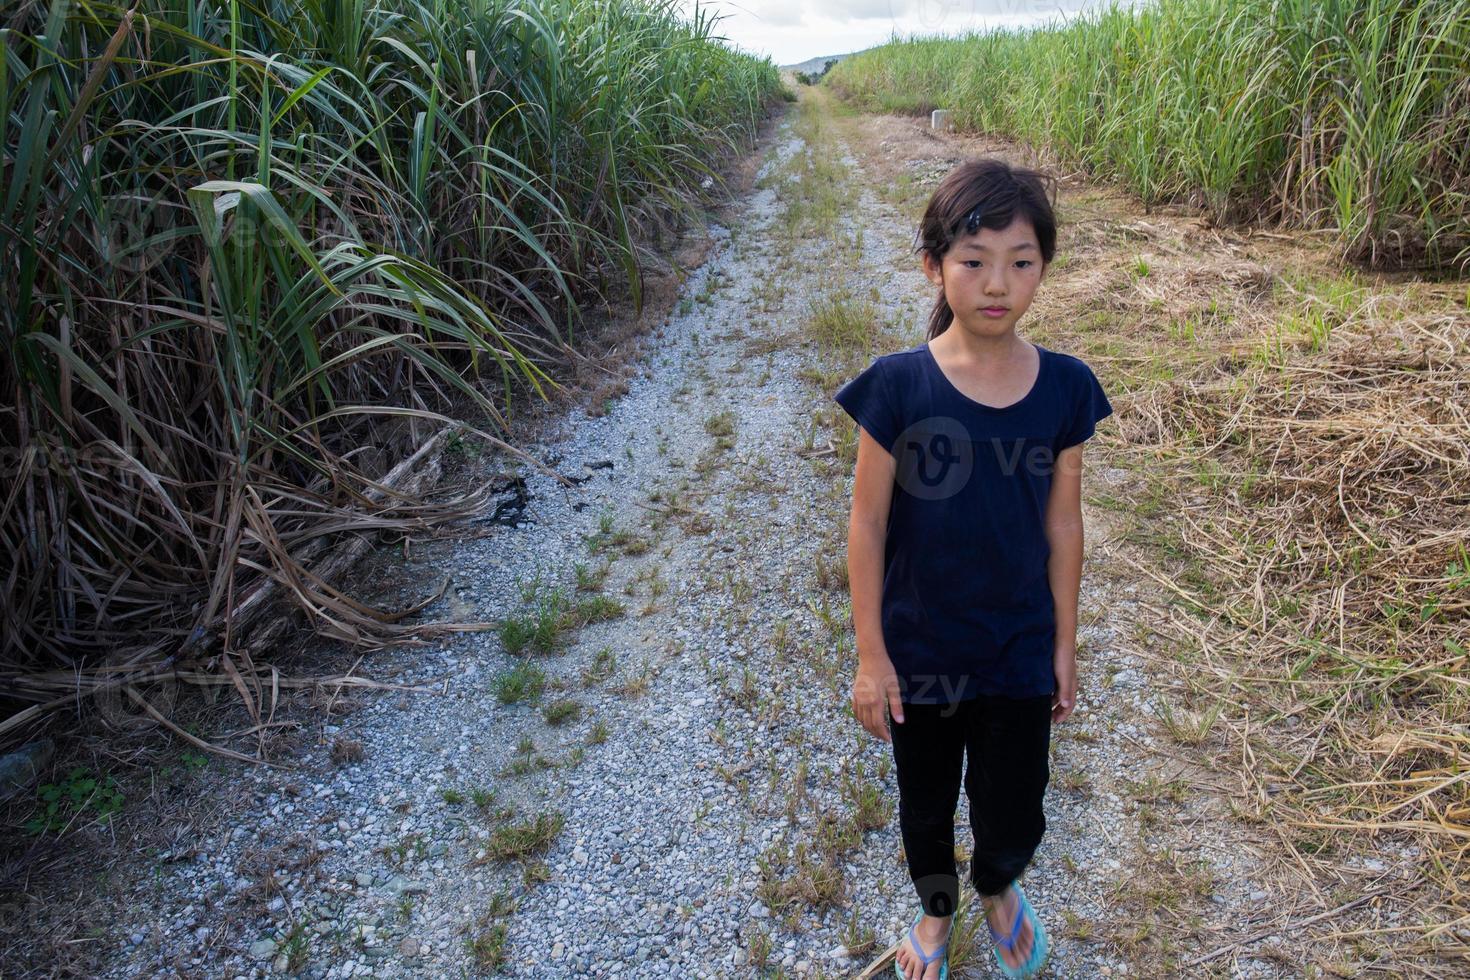 menina andando na estrada reta foto